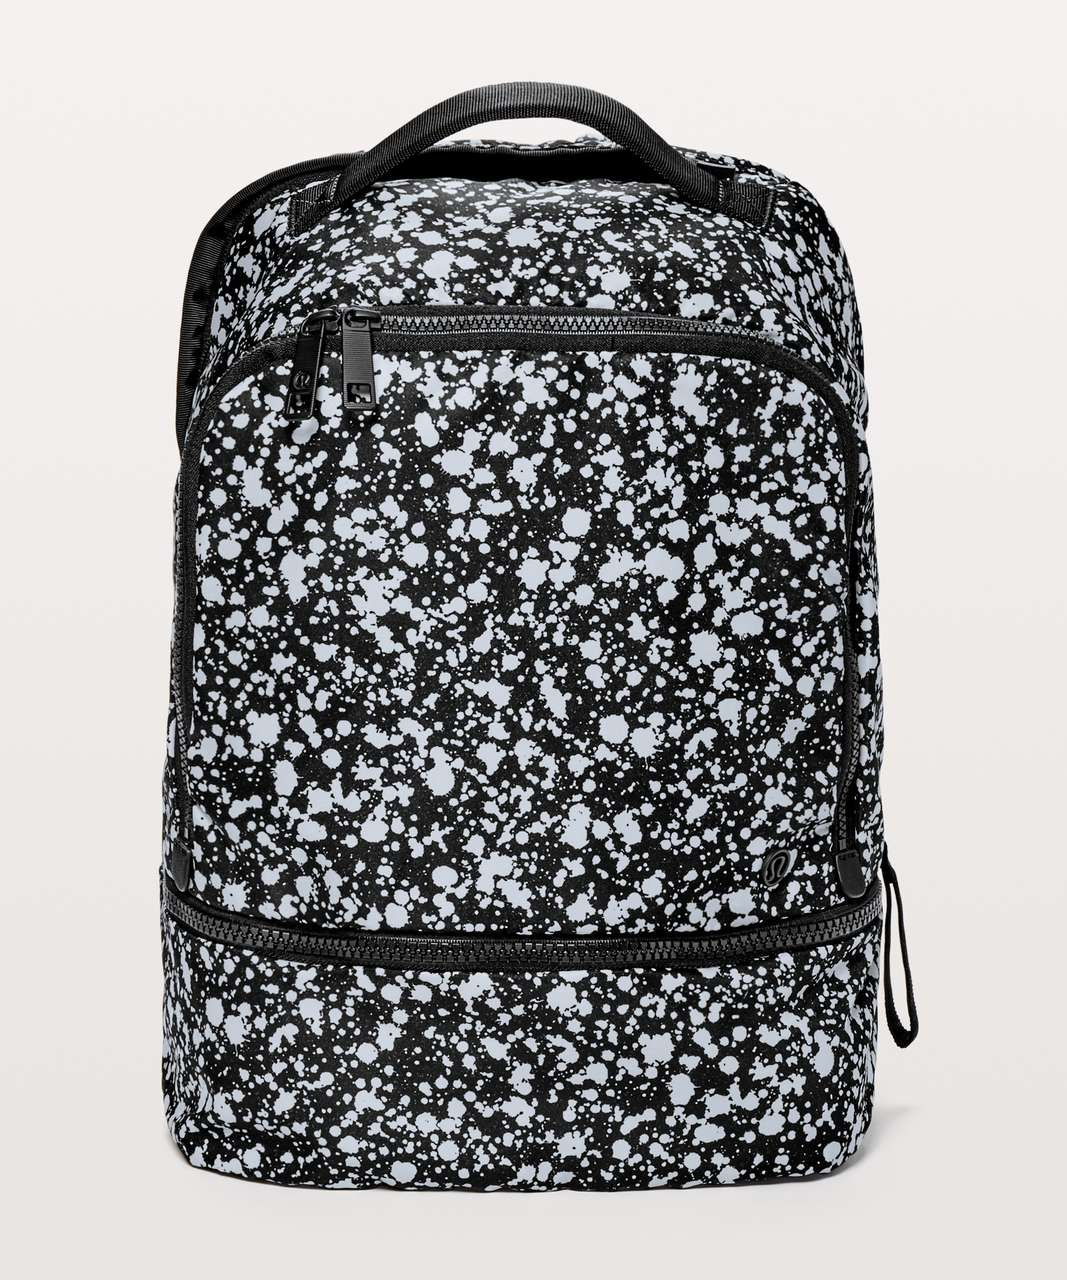 Lululemon City Adventurer Backpack *17L - Bleached Starlight Black